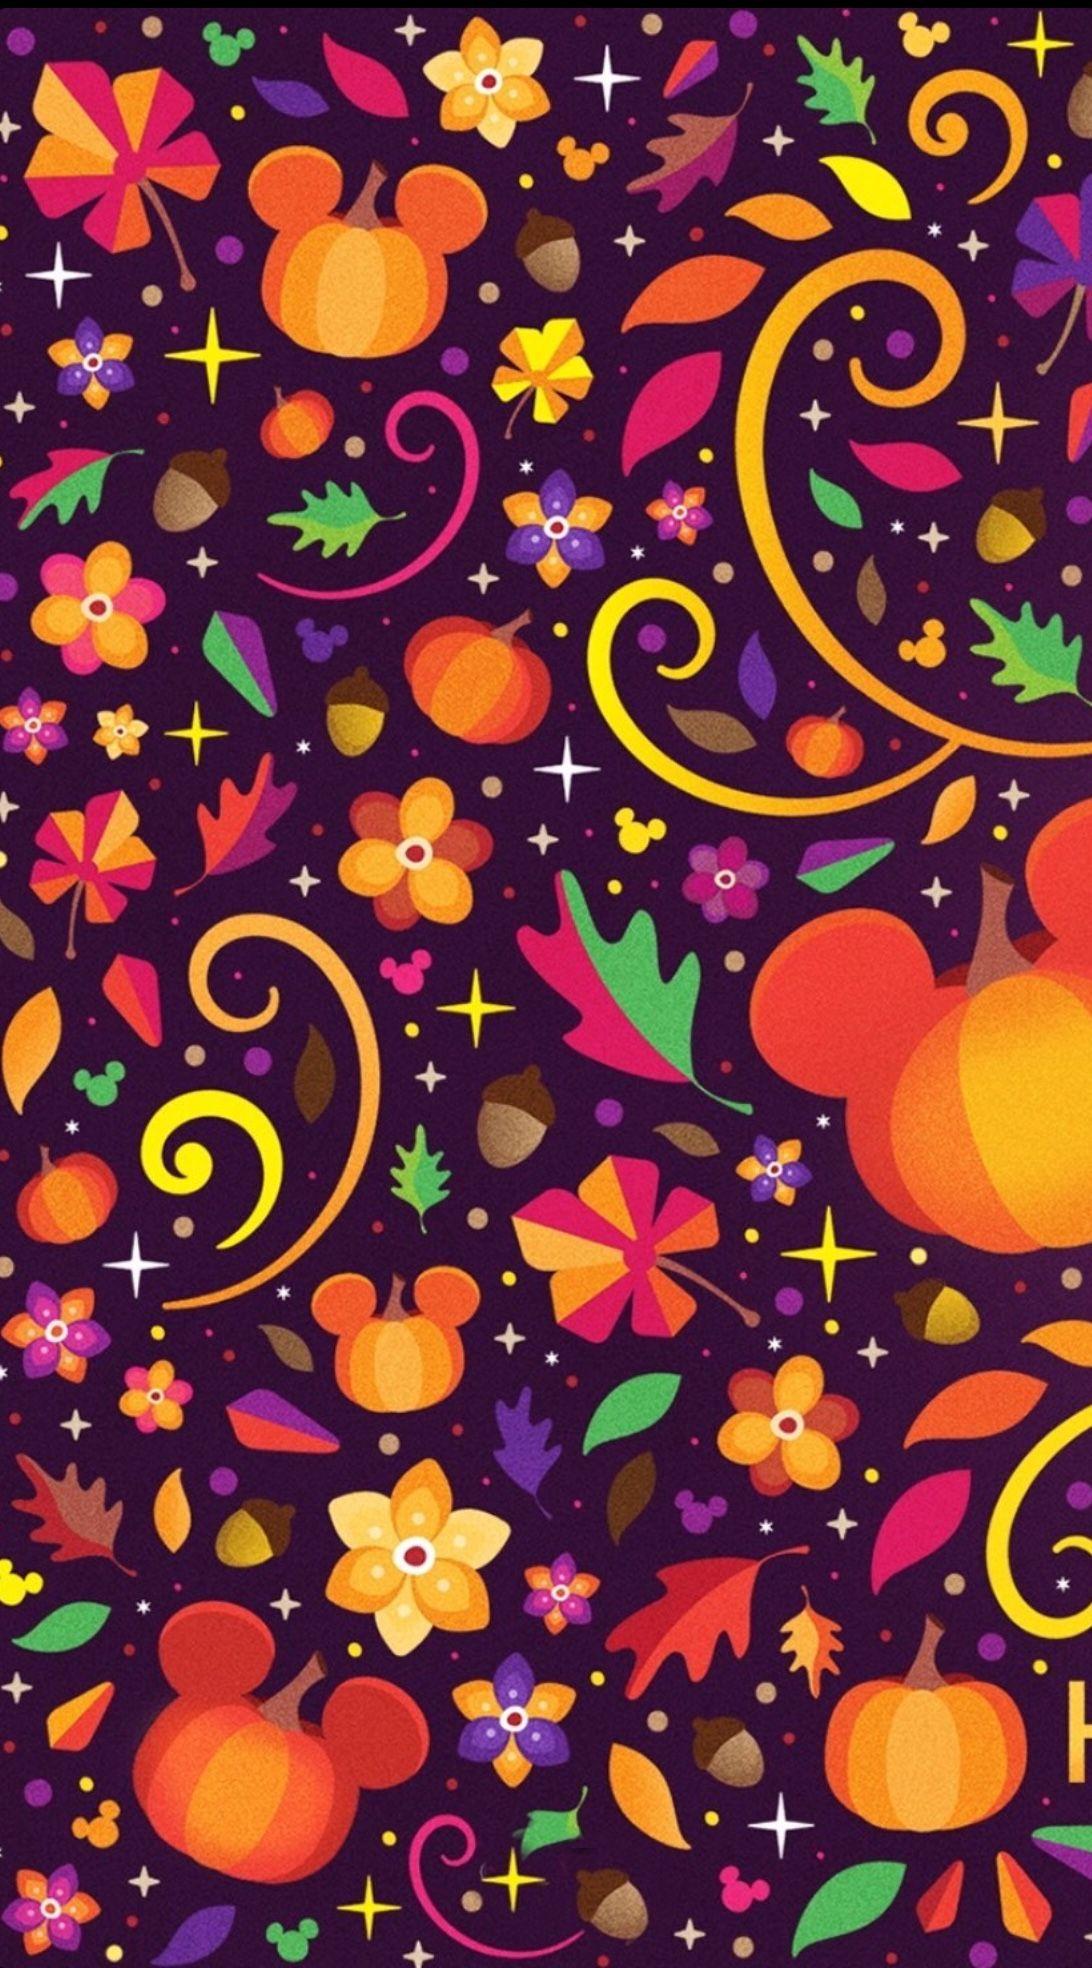 Pin By Cindy Mcnertney On Disney Love Halloween Wallpaper Iphone Thanksgiving Wallpaper Cute Fall Wallpaper